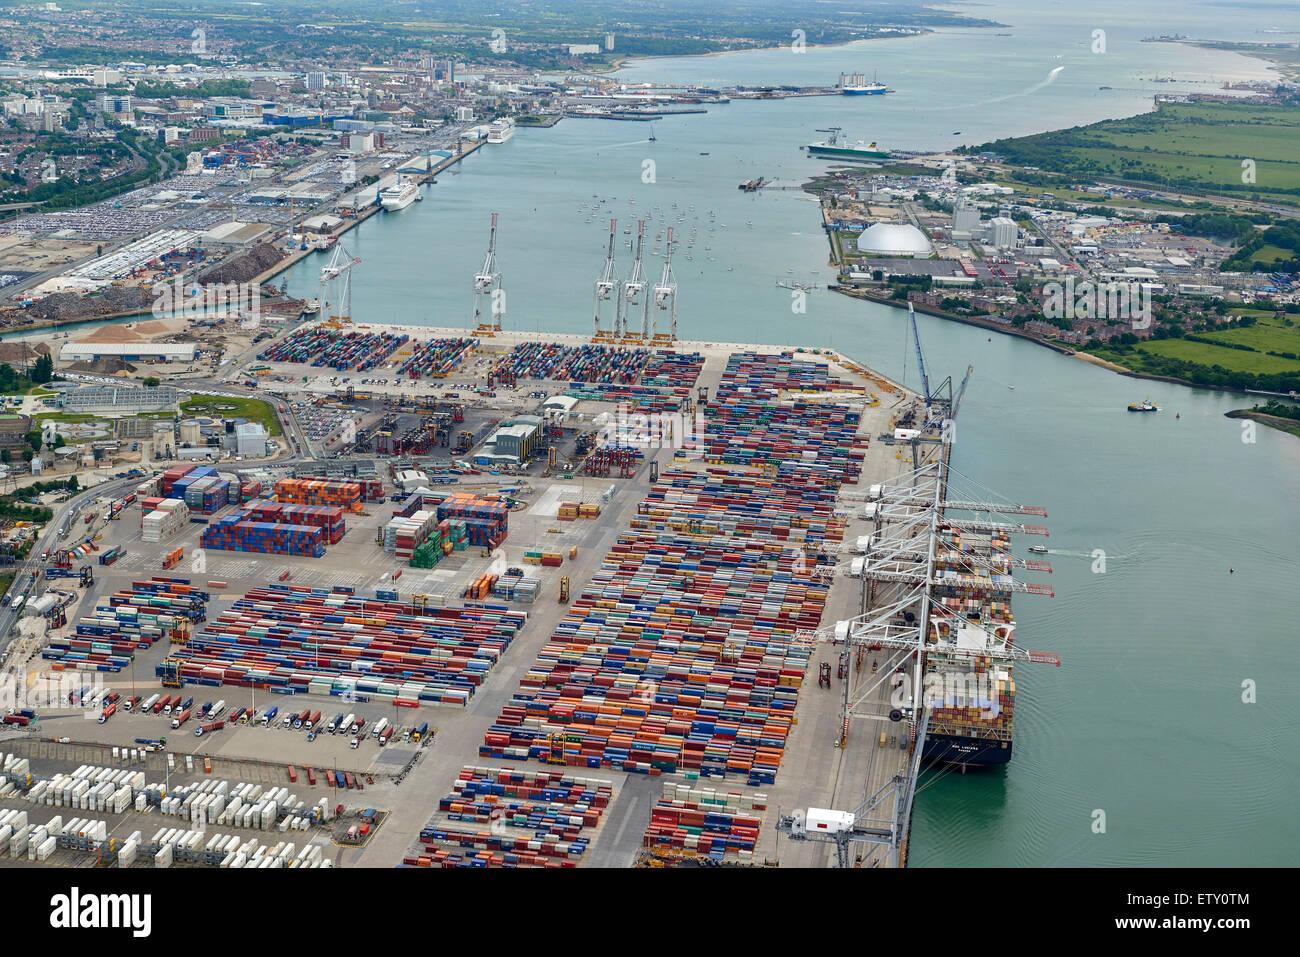 Southampton Docks, southern England, UK - Stock Image